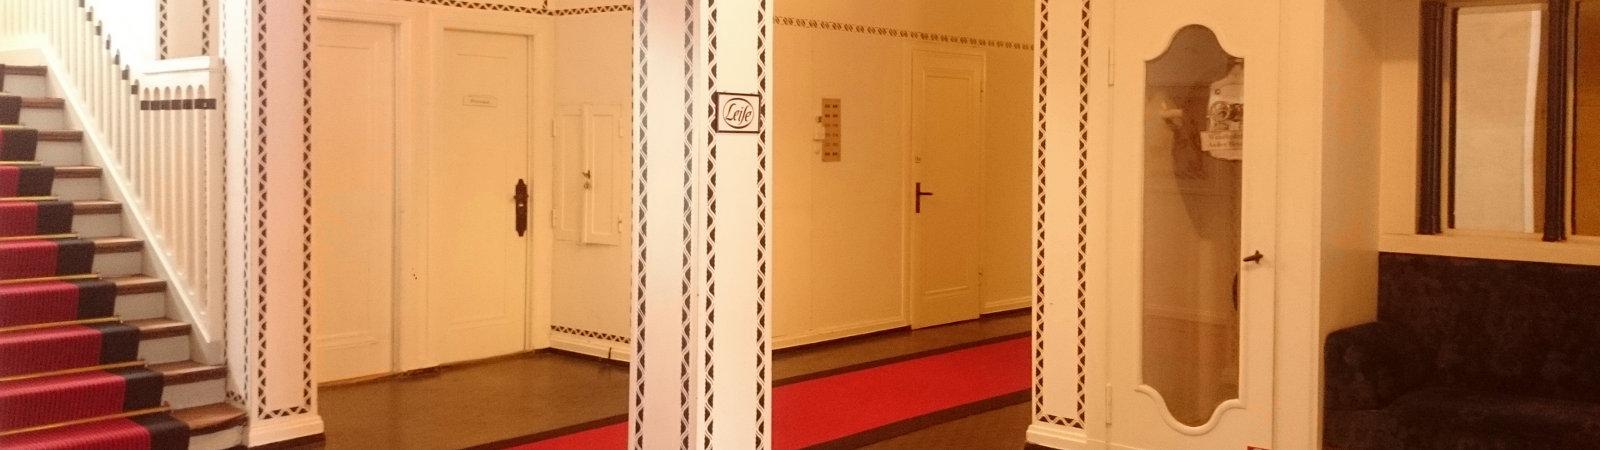 Flure - Klinik Psychosomatik & Sanatorium Dr. Barner